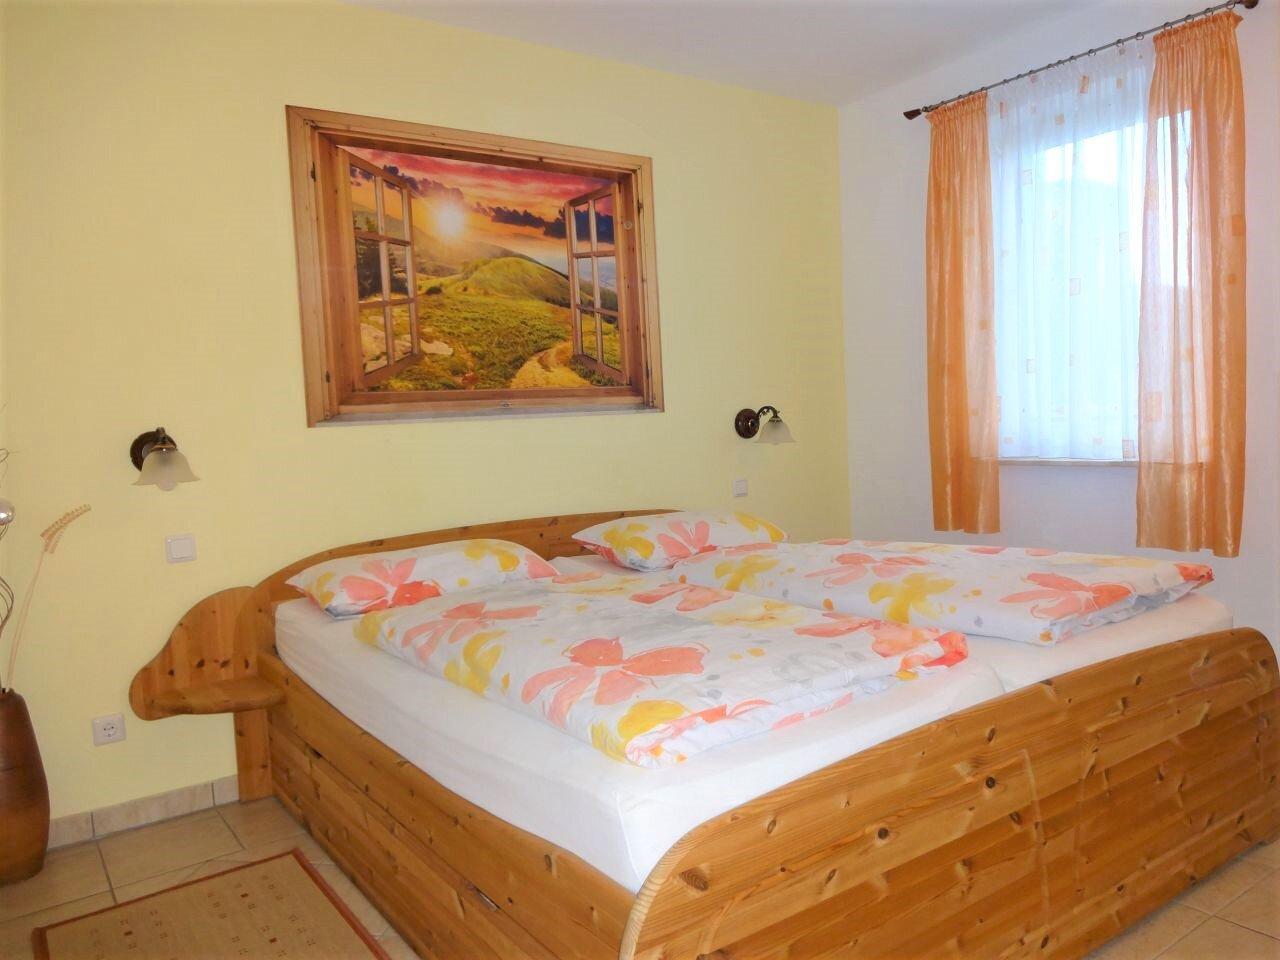 Schlafzimmer mit Massivholz-Doppelbett